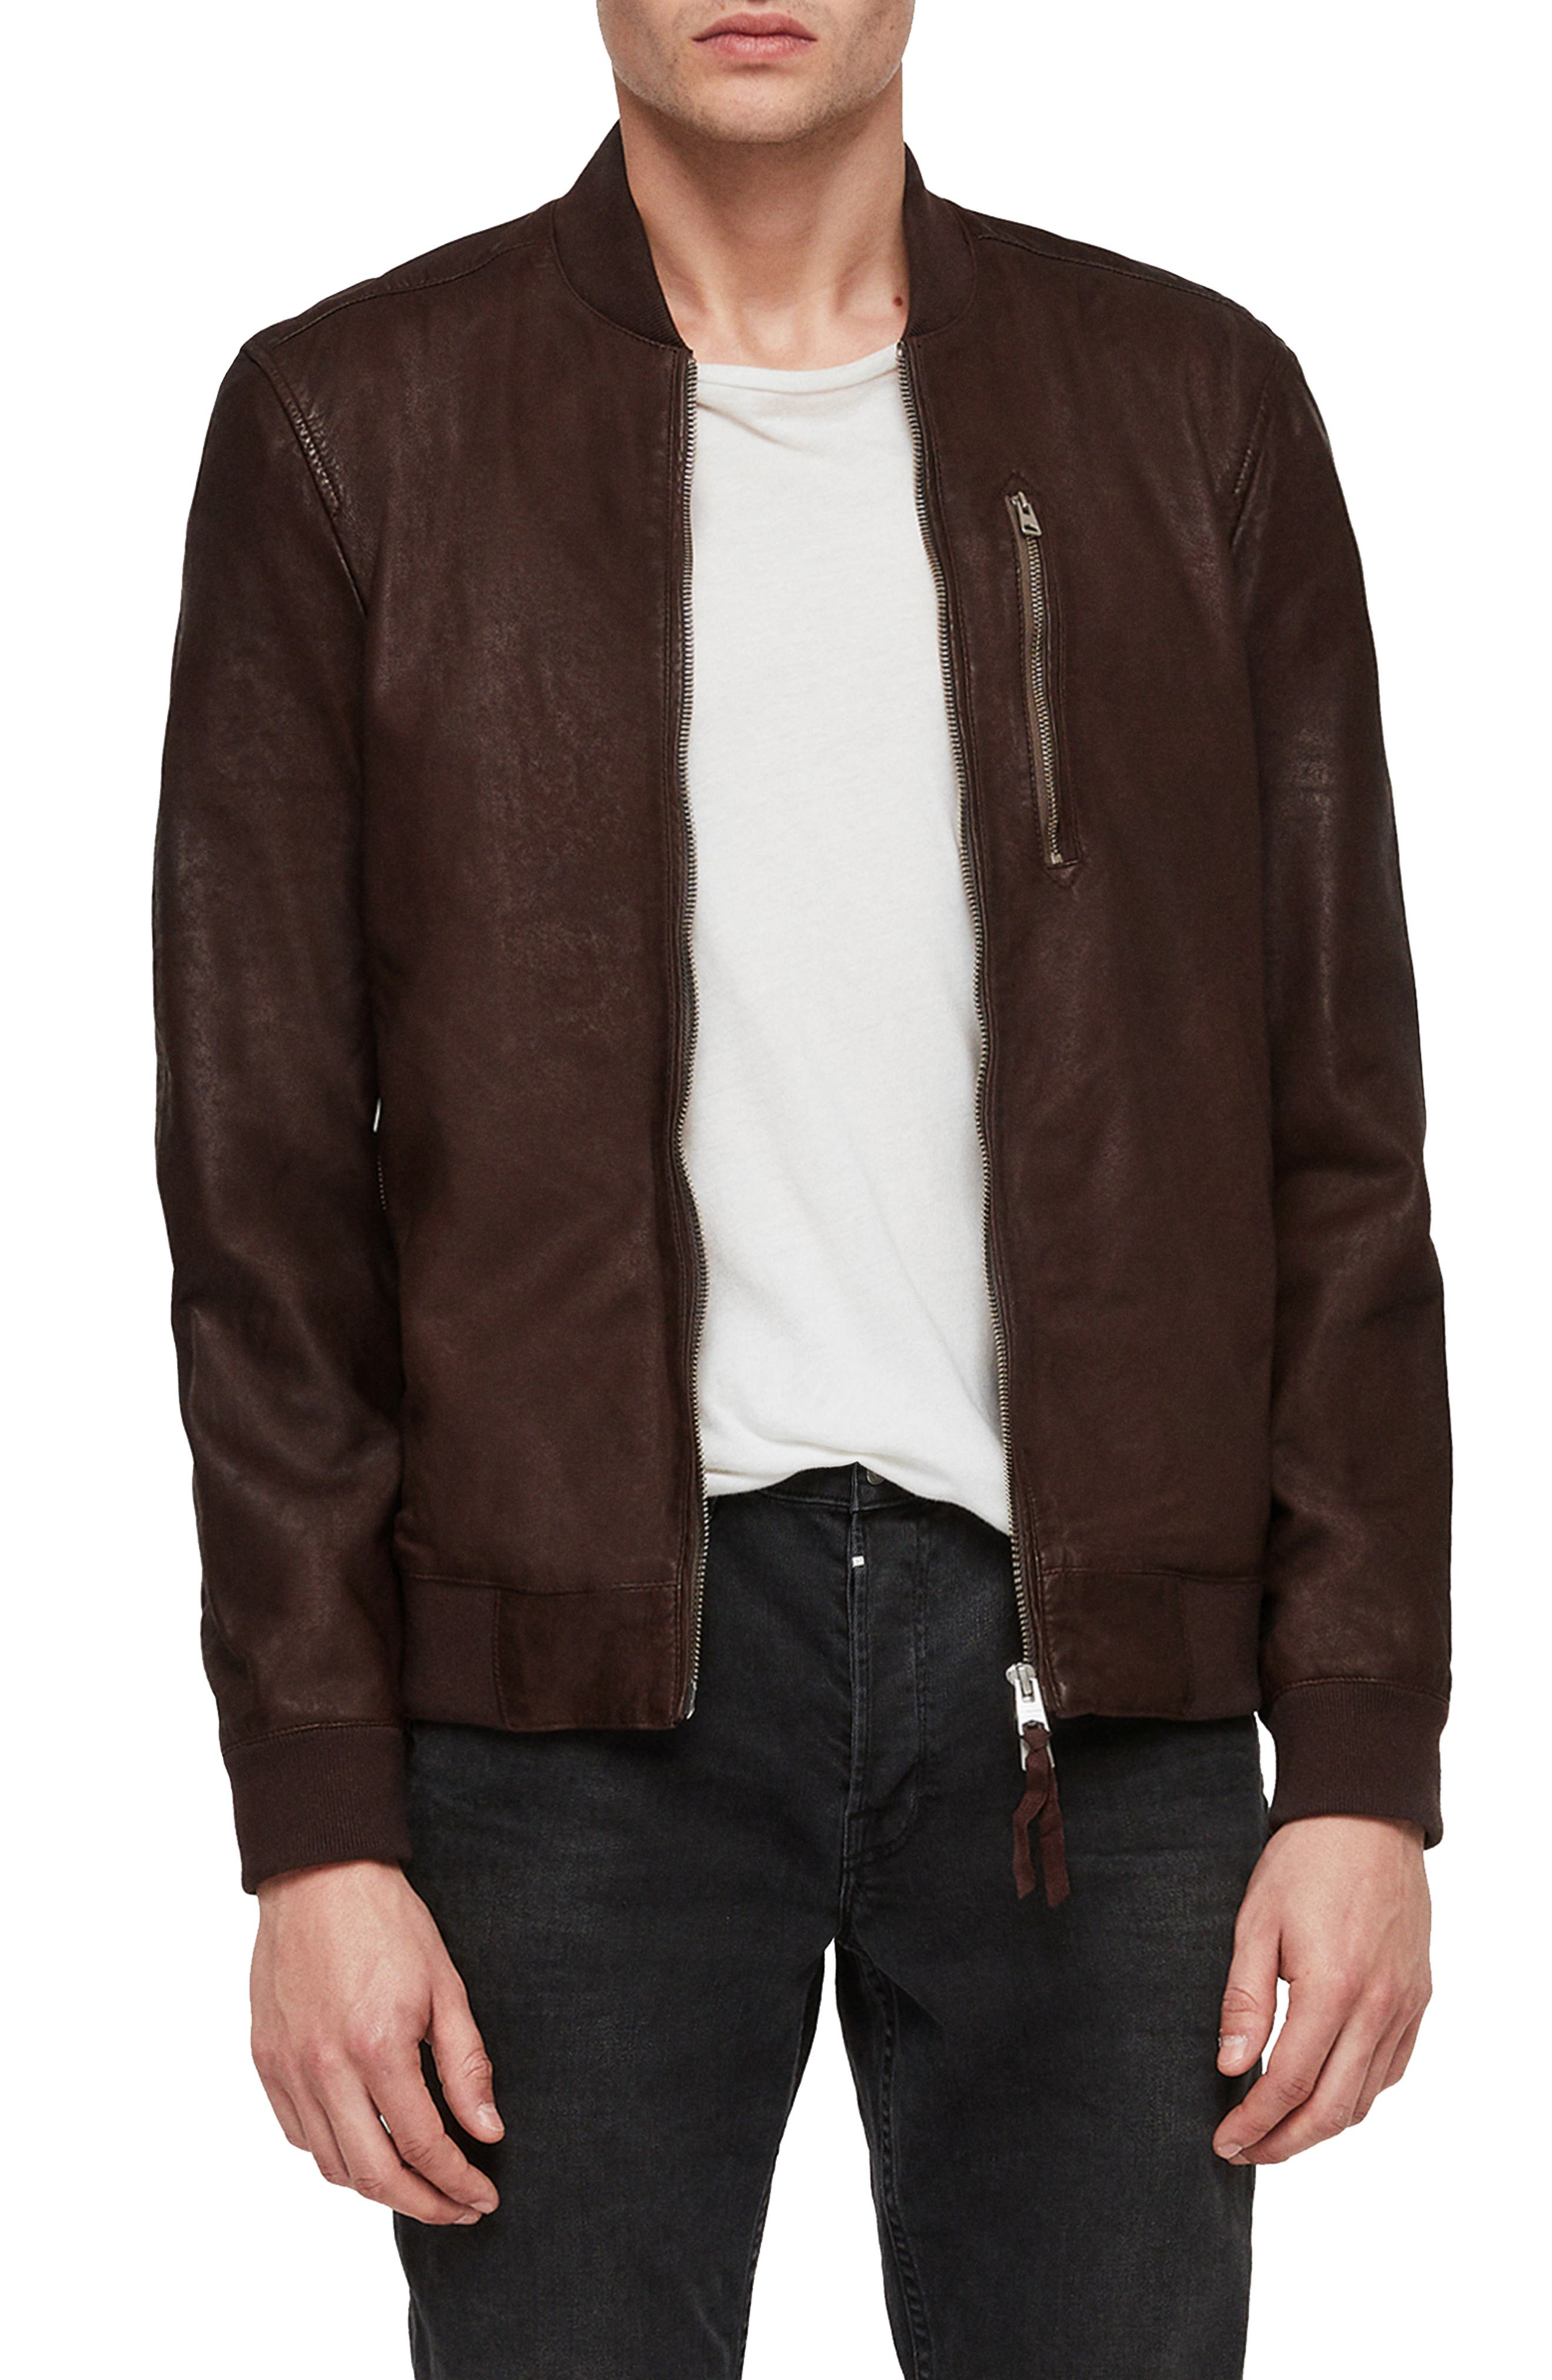 Kino Leather Bomber Jacket,                         Main,                         color, OXBLOOD